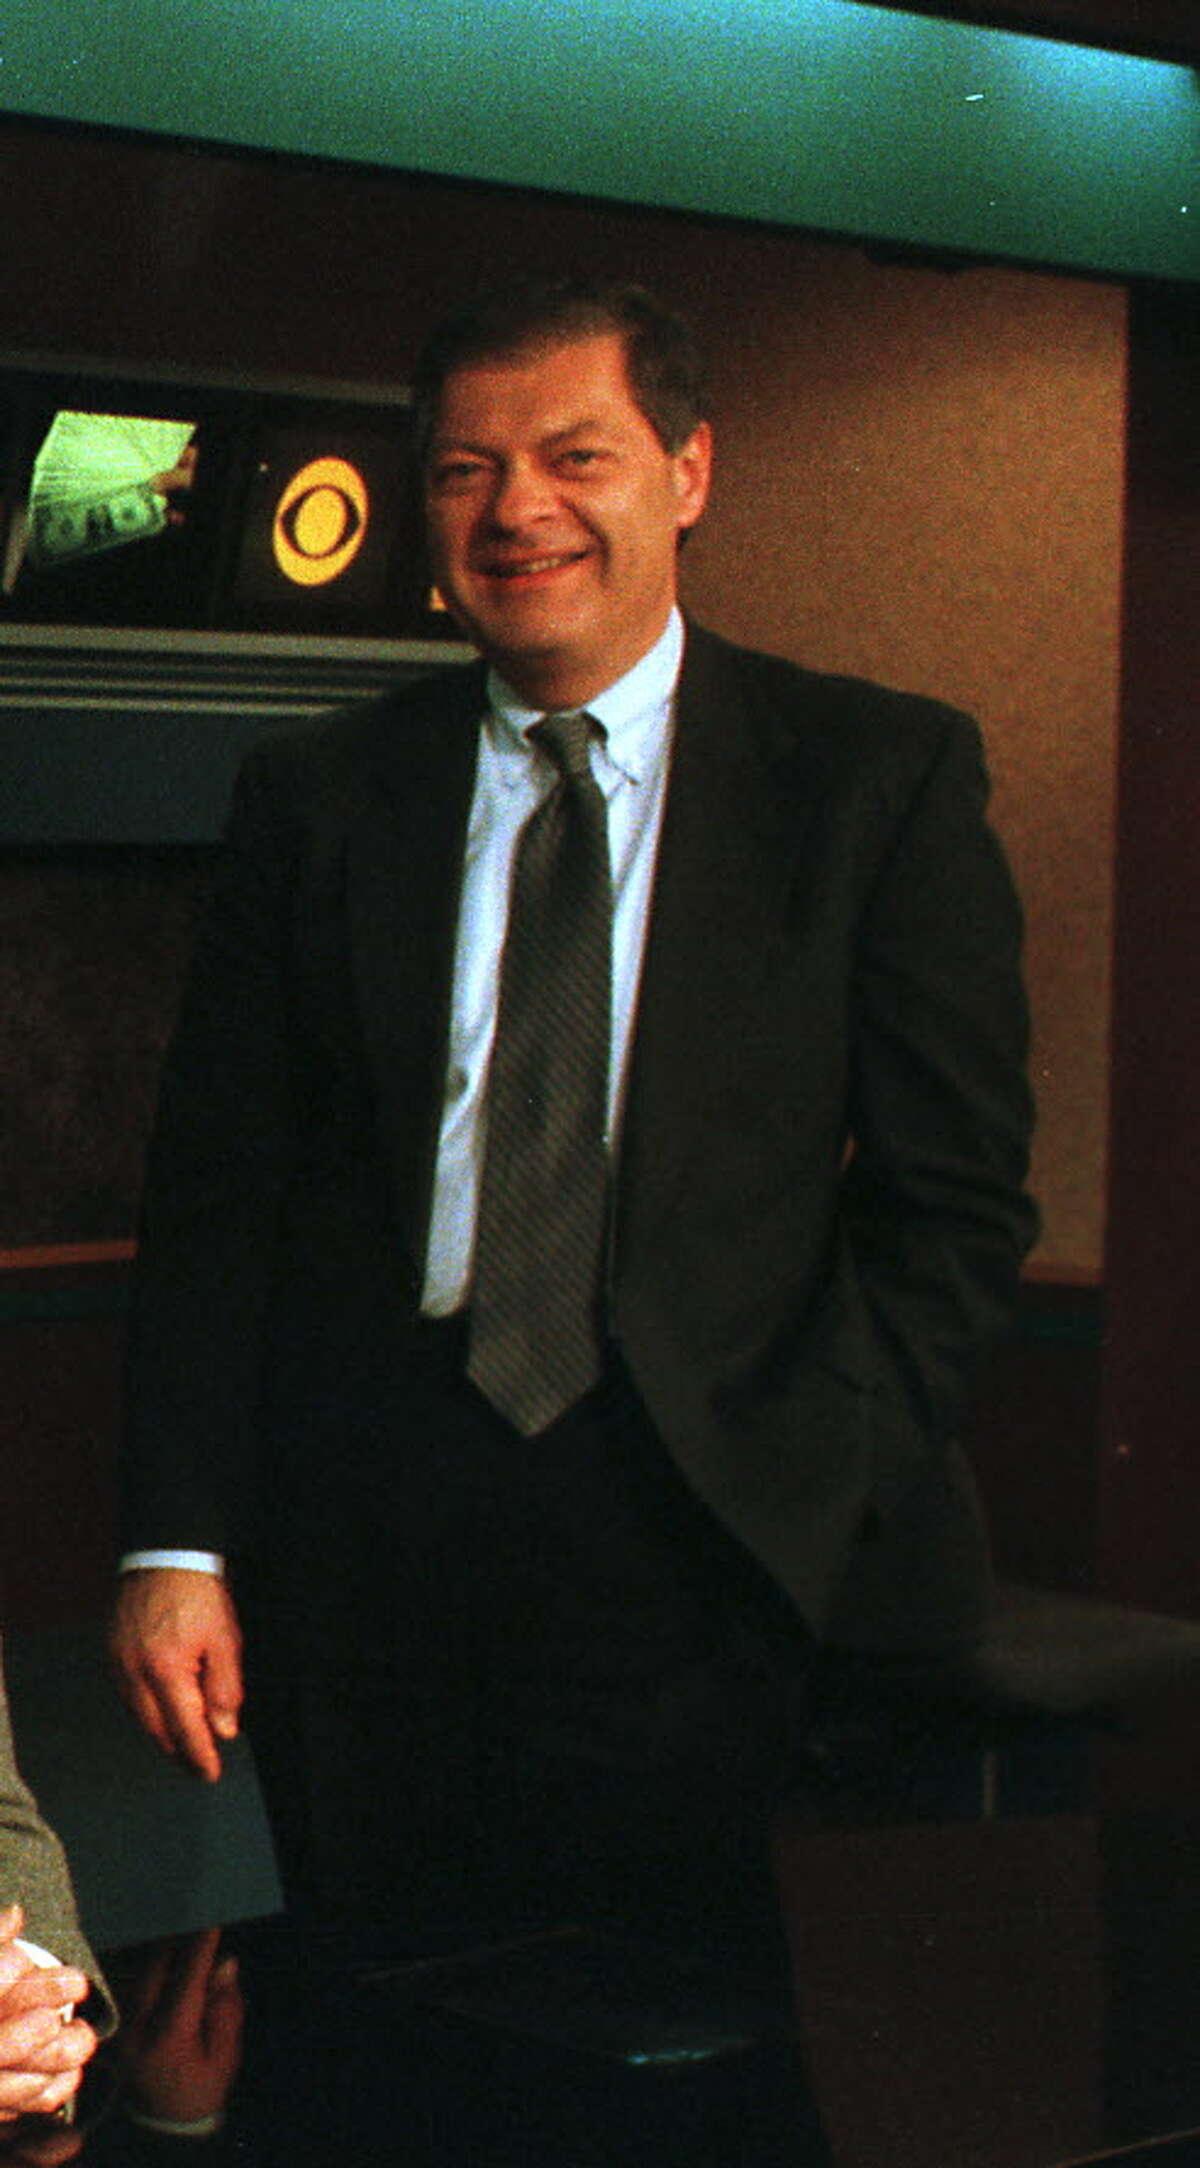 Ed O'Brien on the WRGB news set Tuesday, Feb. 27, 2001, in Niskayuna, N.Y. (Jonathan Fickies/Times Union archive)